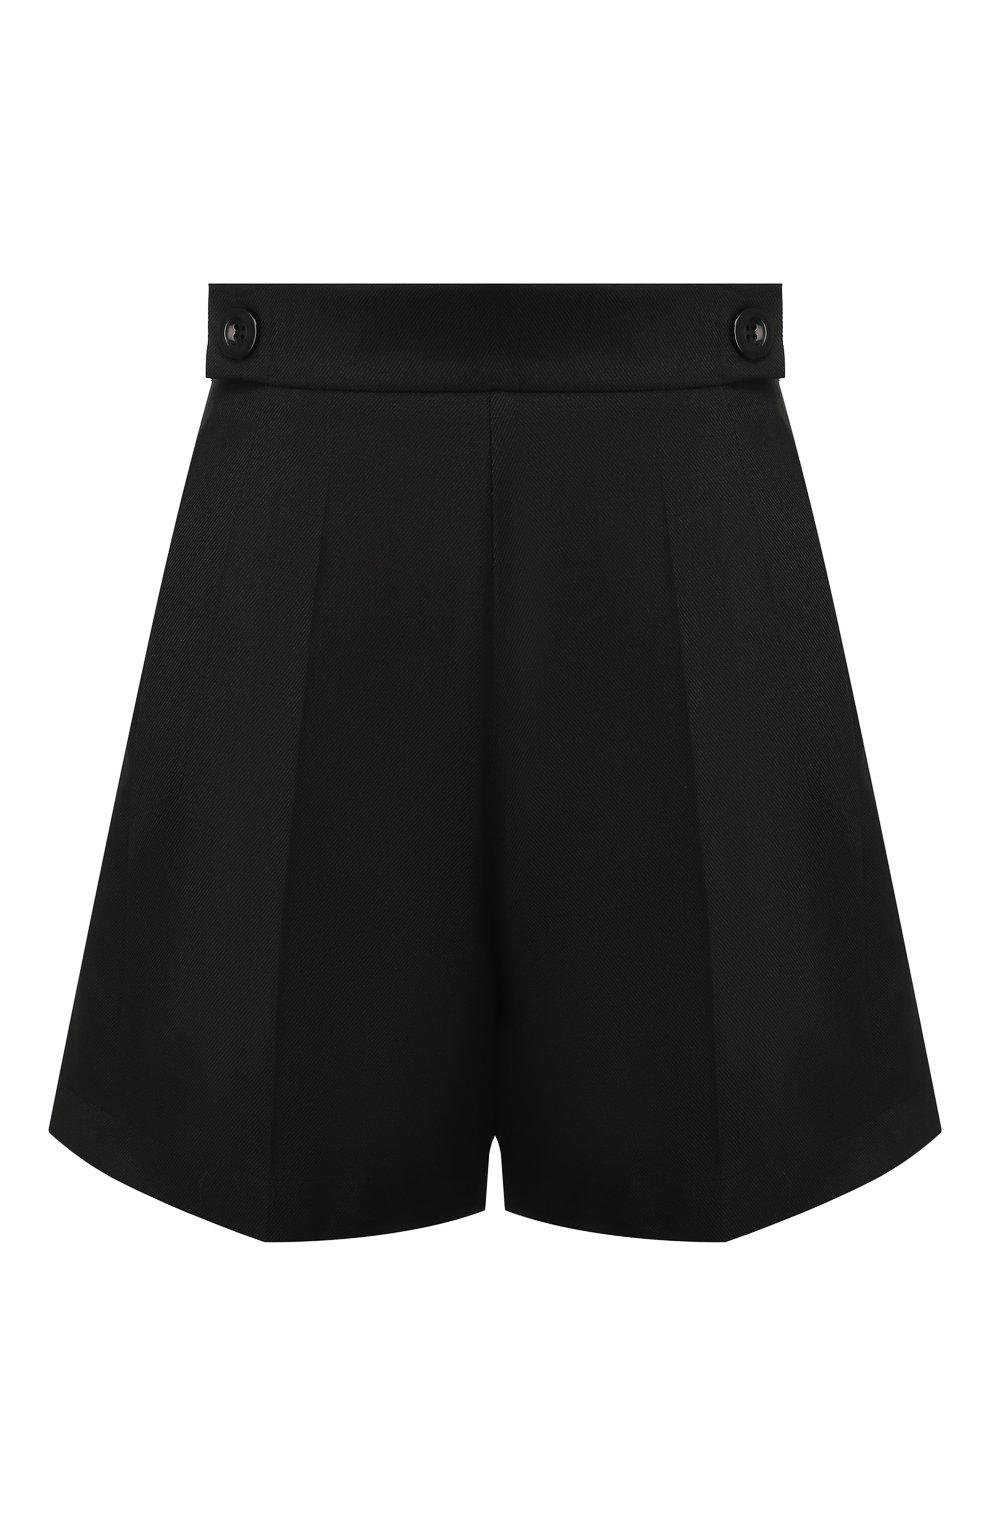 Женские шорты TEREKHOV GIRL черного цвета, арт. 2SR001/8799.900/W20 | Фото 1